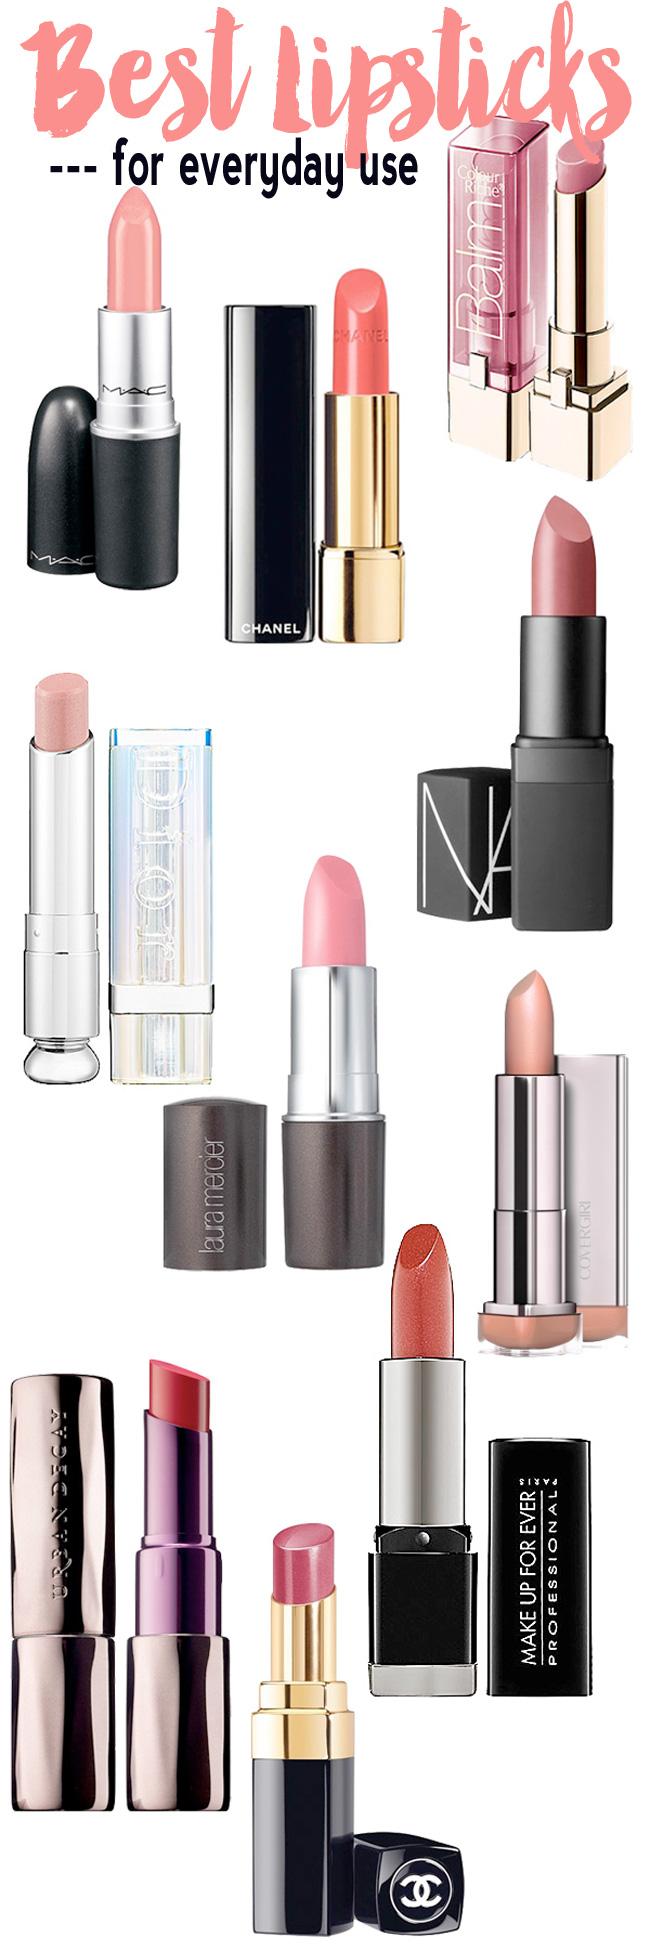 Best Lipsticks for Everyday Use